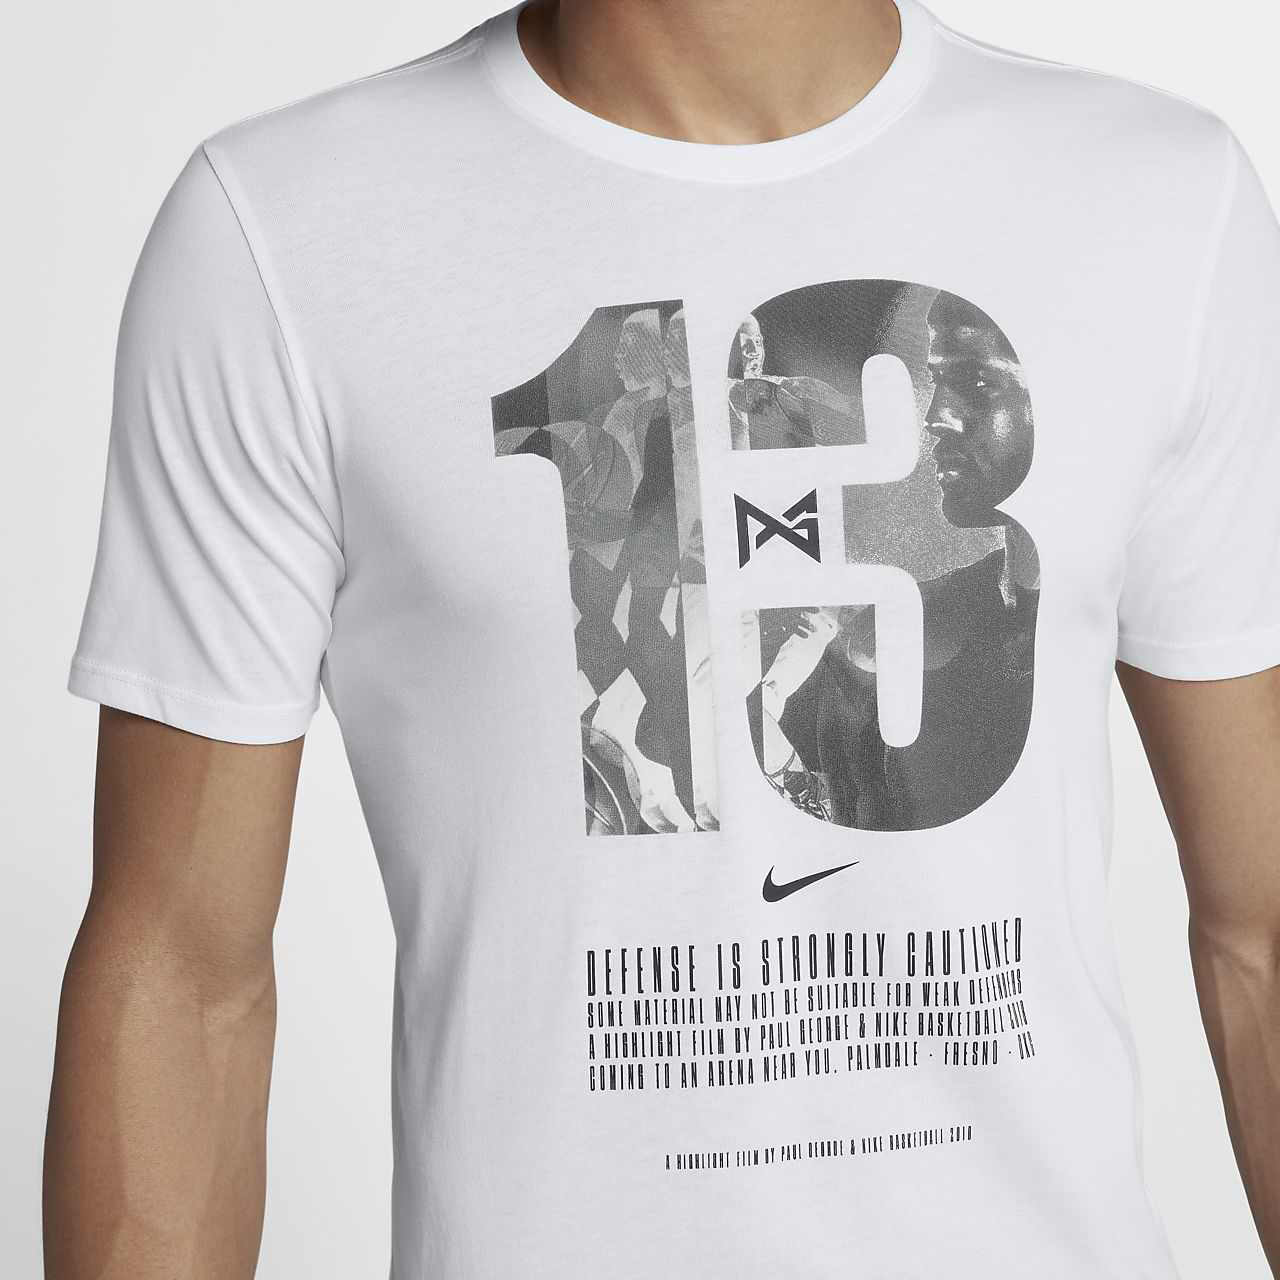 ... Nike Dri-FIT PG 13 Men's Basketball T-Shirt